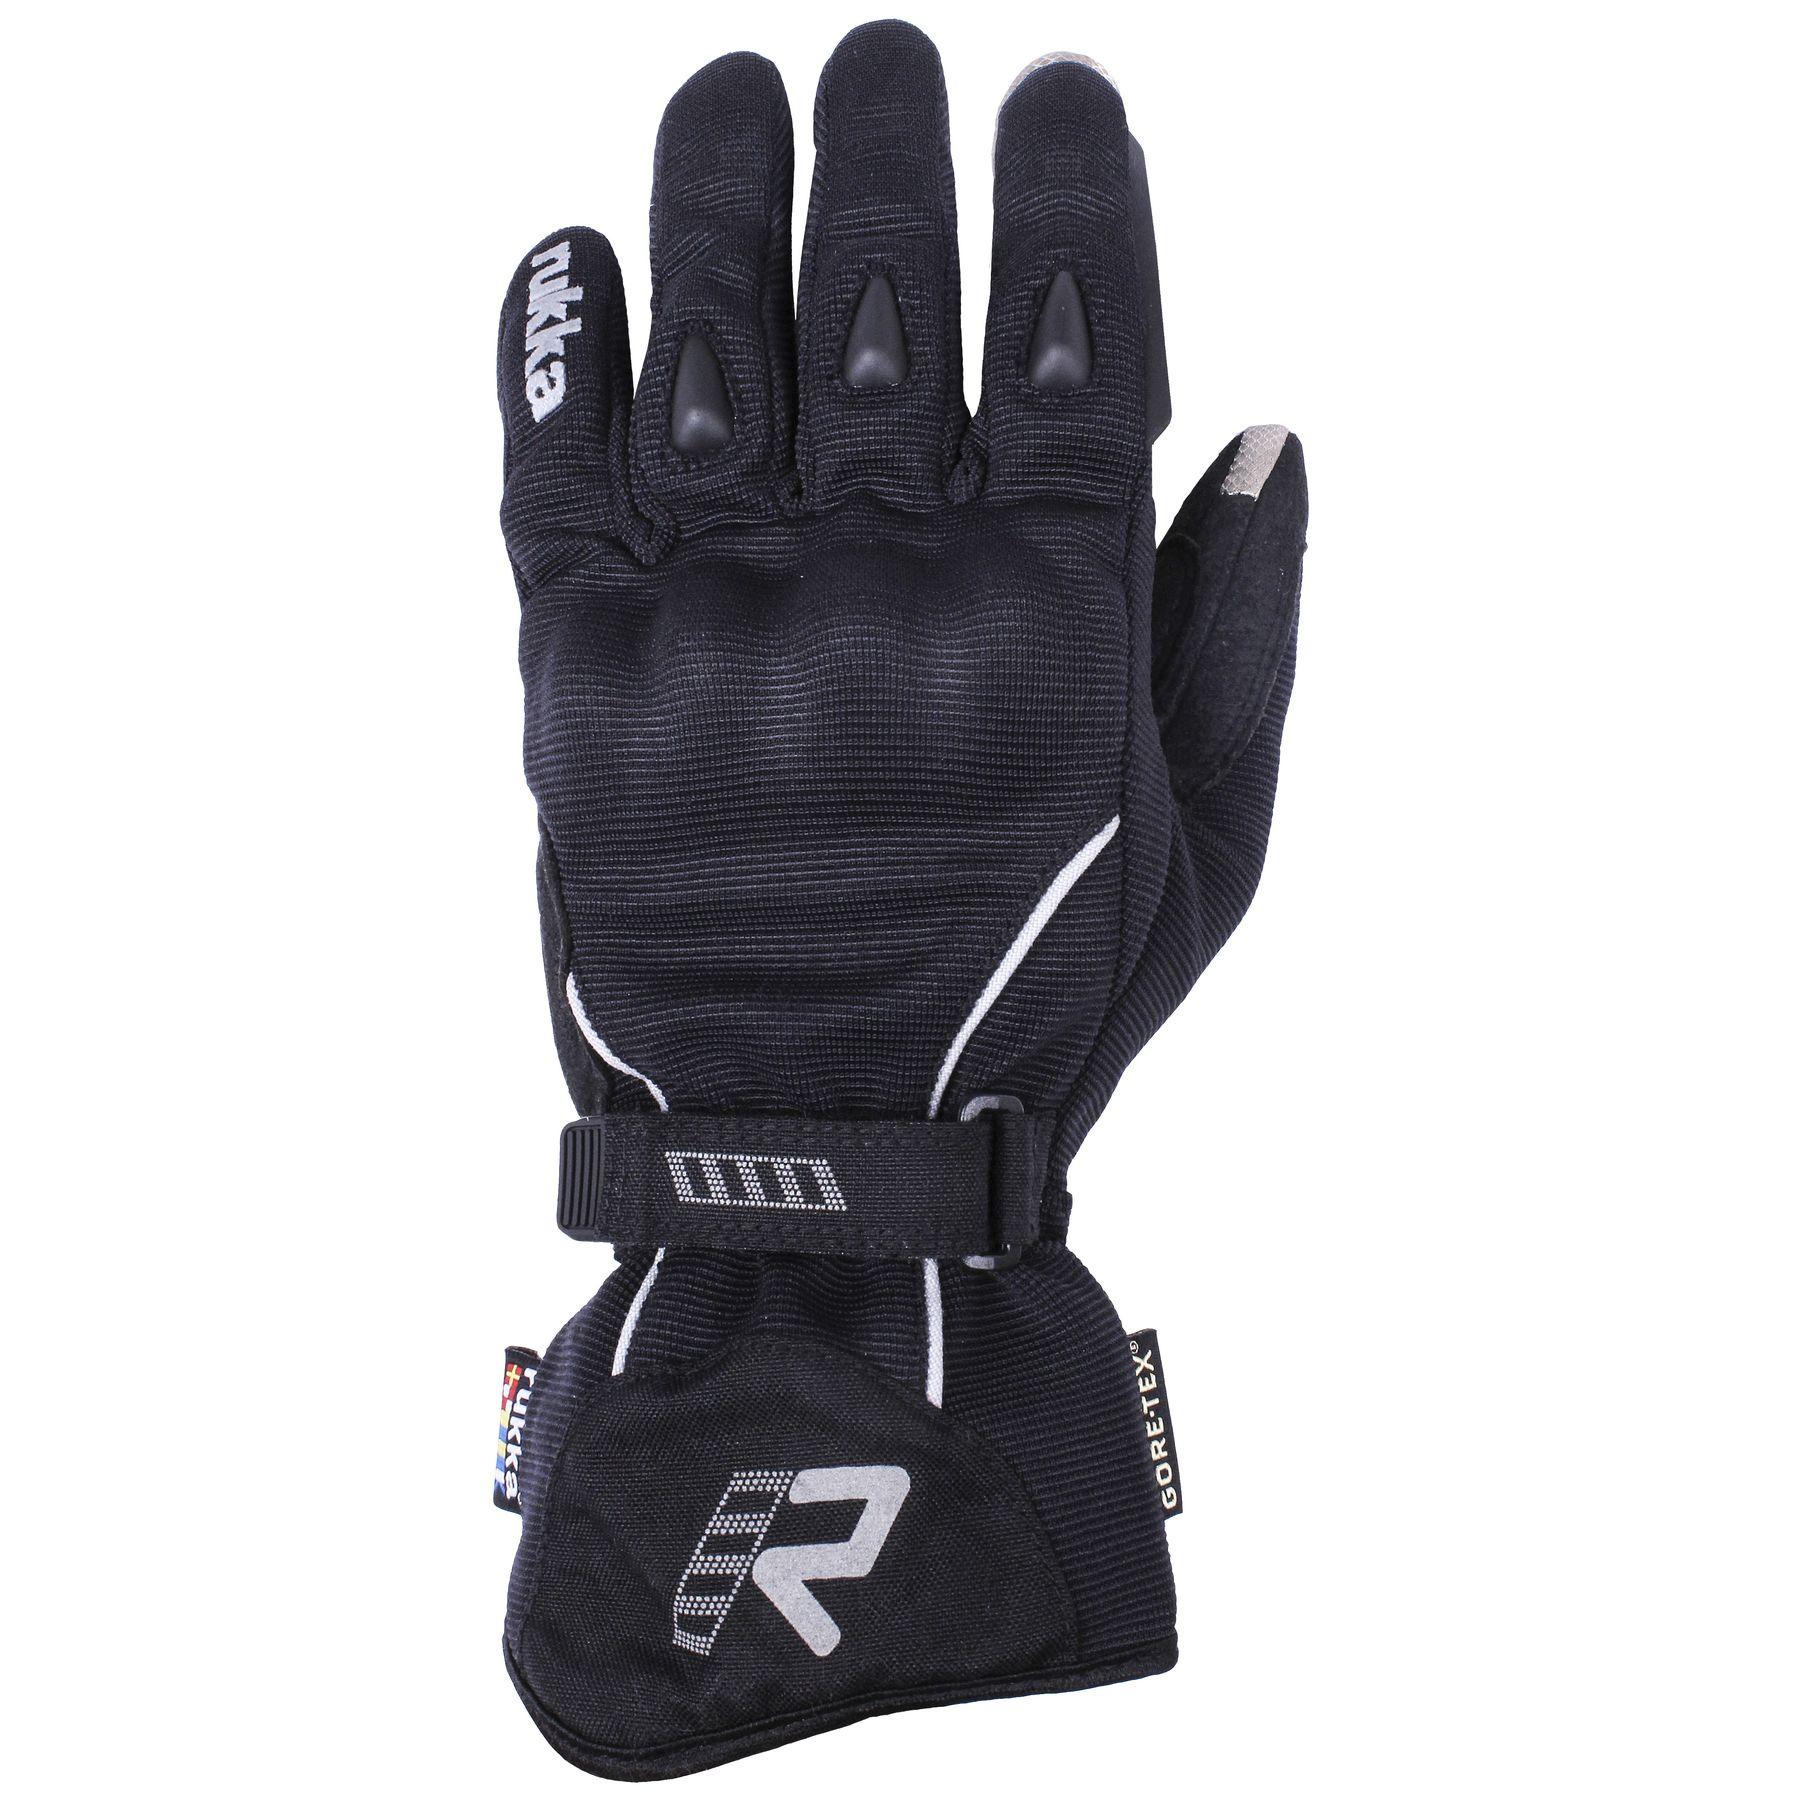 Rukka Virium Gloves